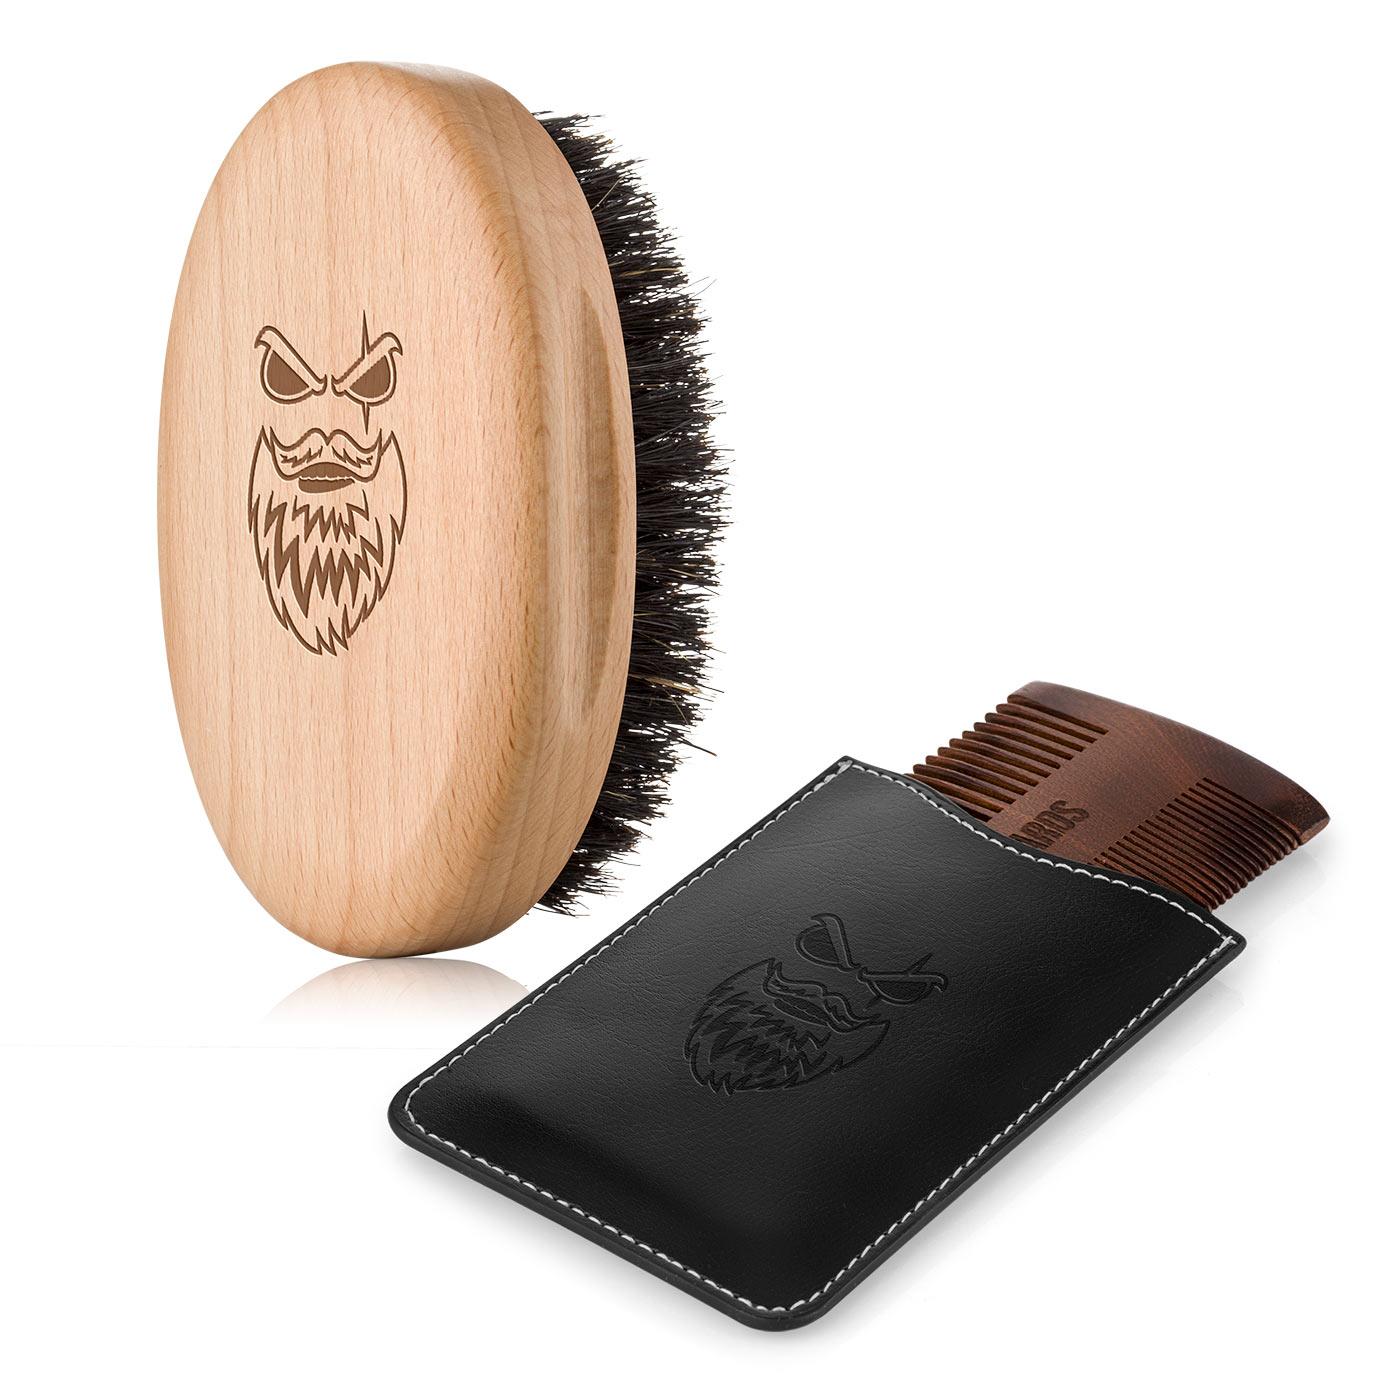 Set kartáč a hřeben na vousy - Gentler